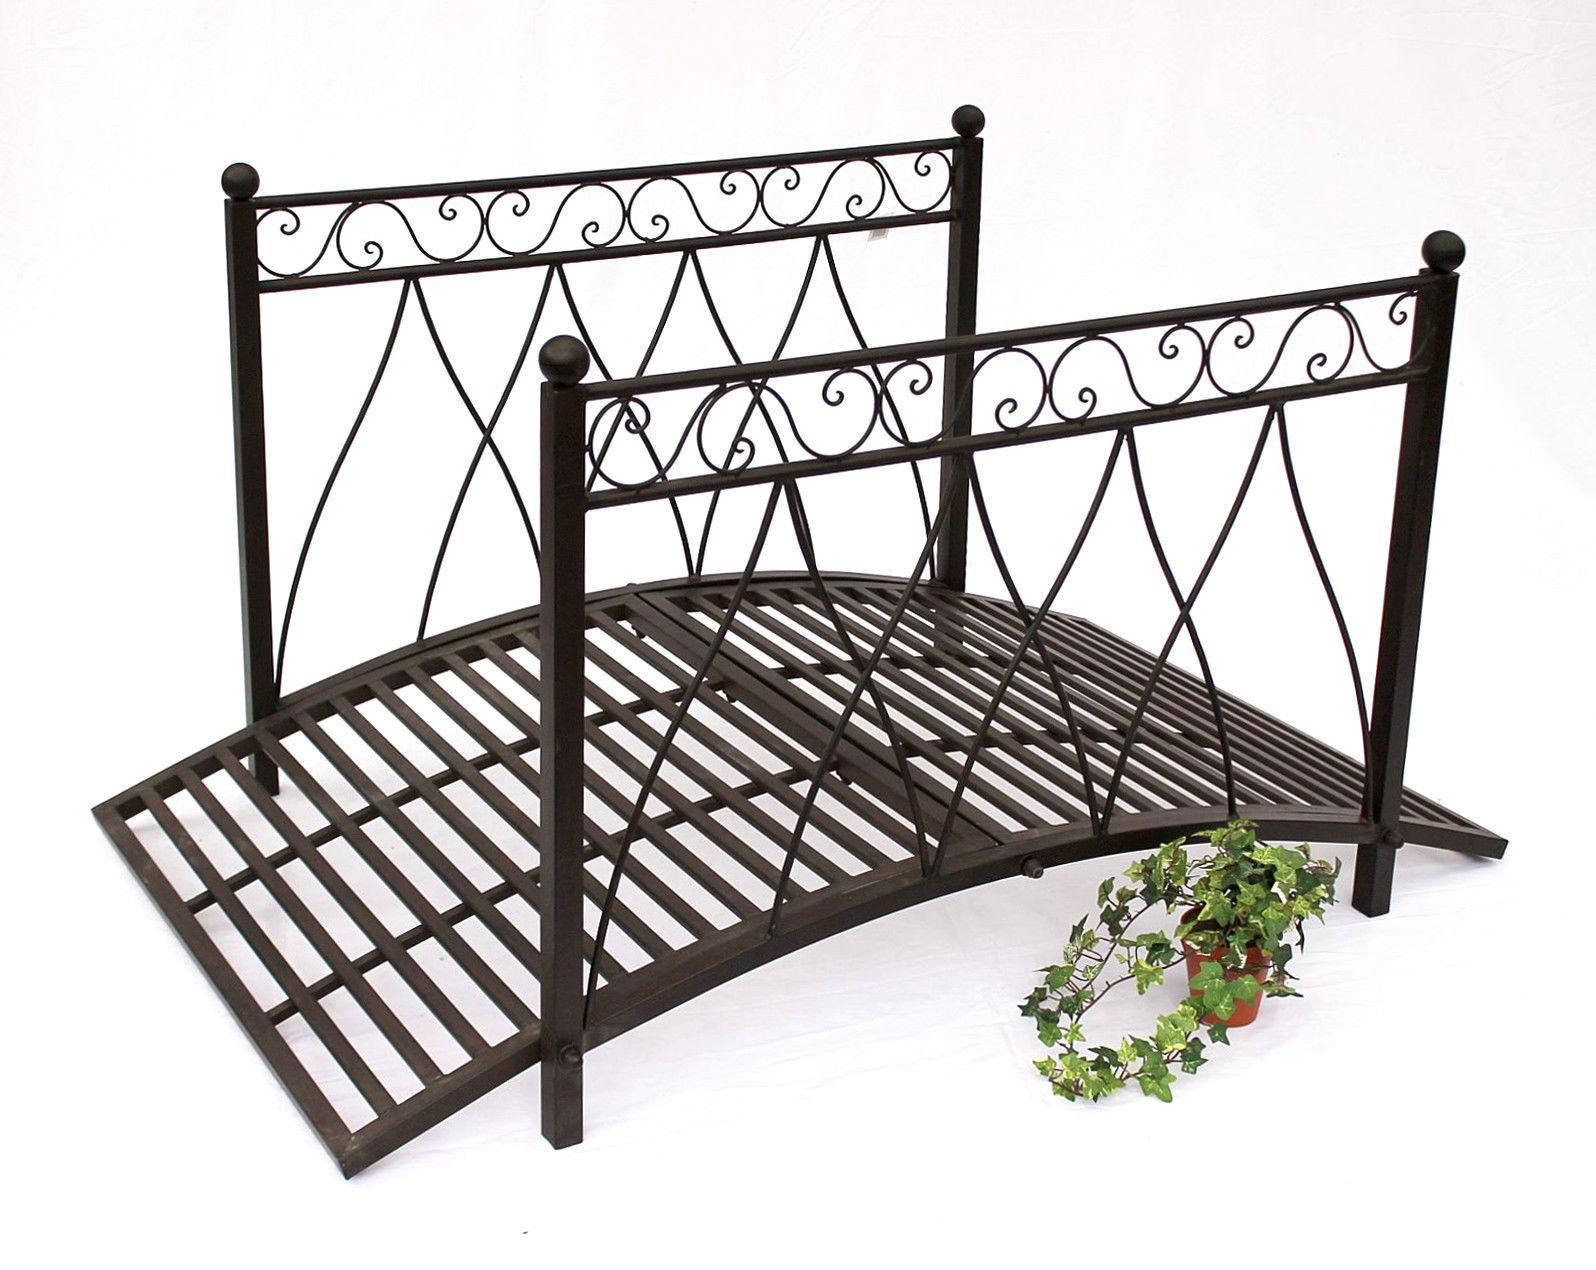 br cke aus metall 111252 eisenbr cke 145 cm gartenbr cke metallbr cke gartendeko ebay. Black Bedroom Furniture Sets. Home Design Ideas